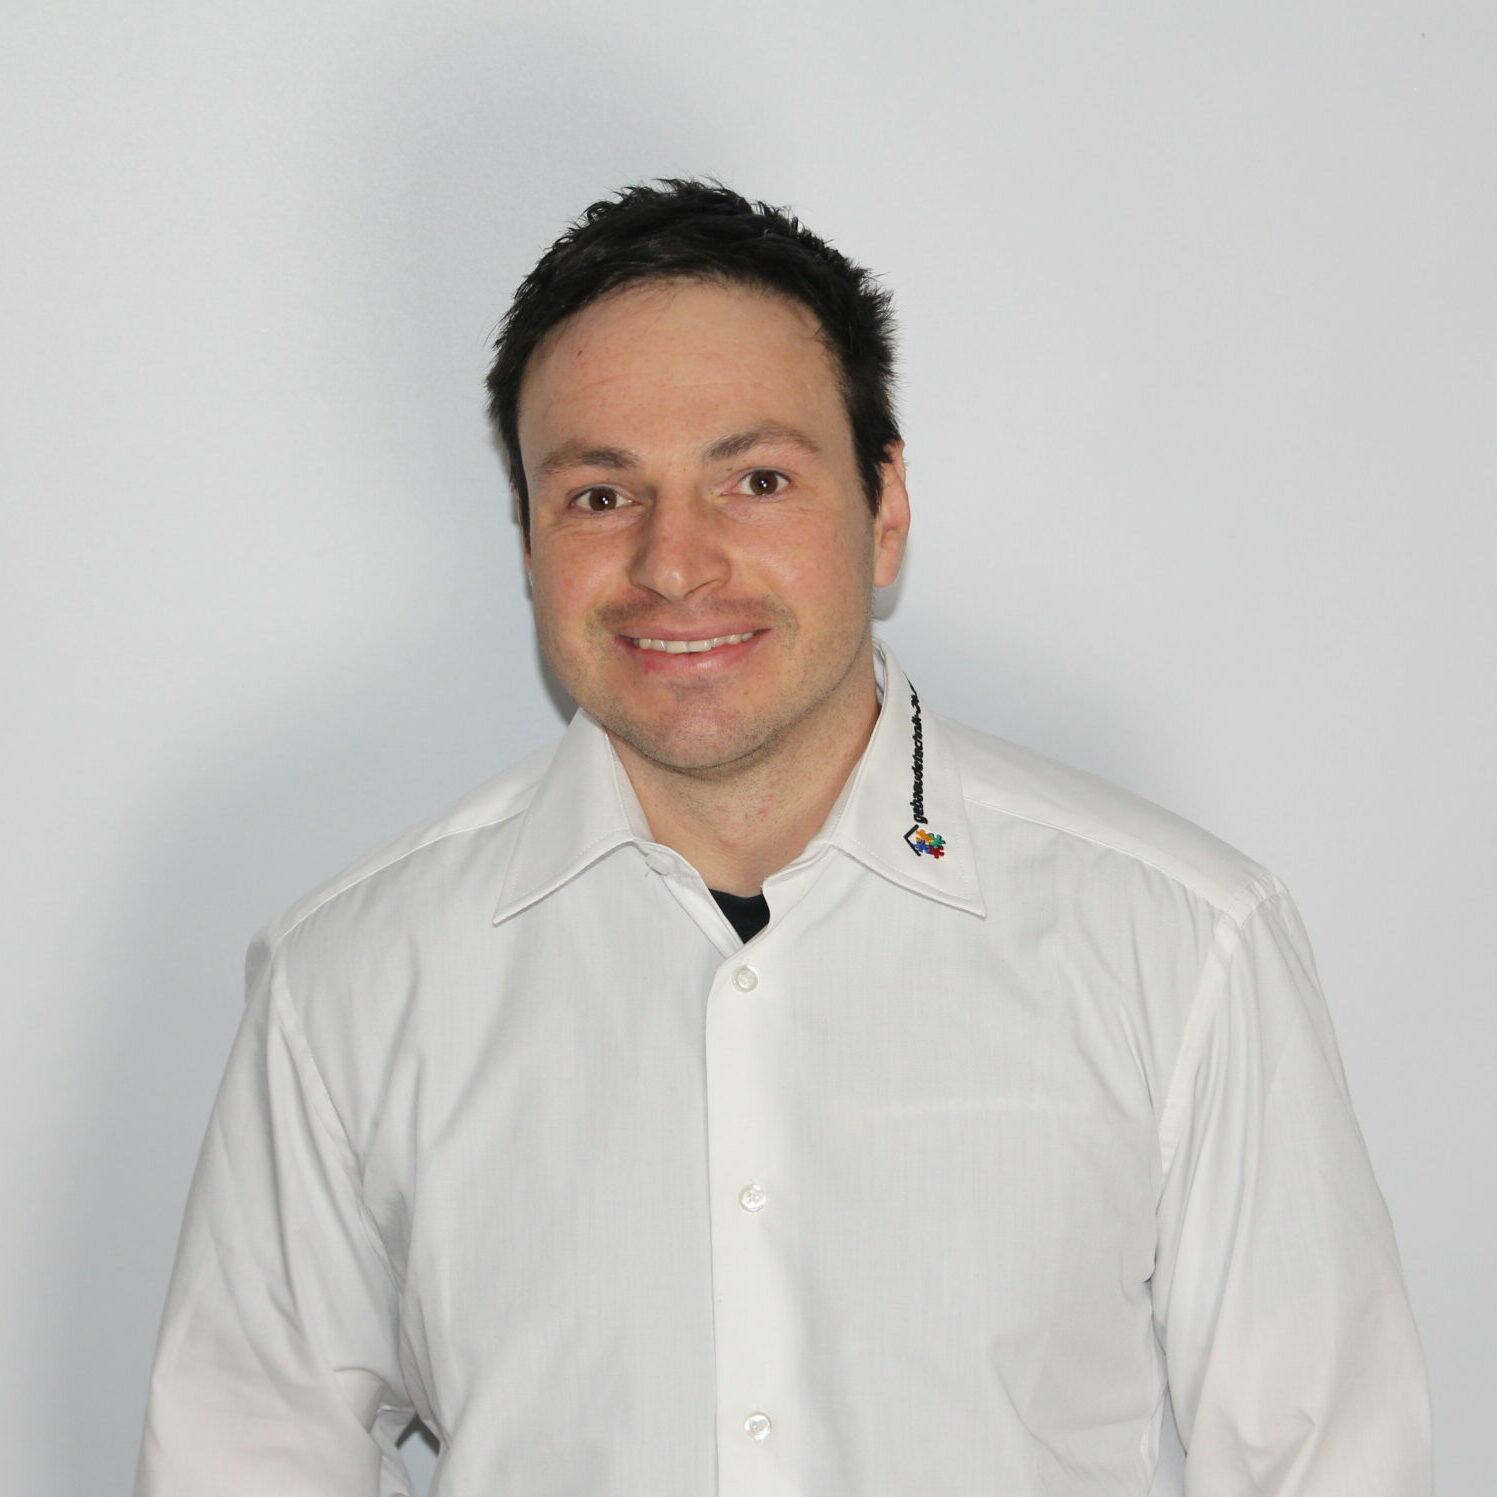 Johannes Stelzl